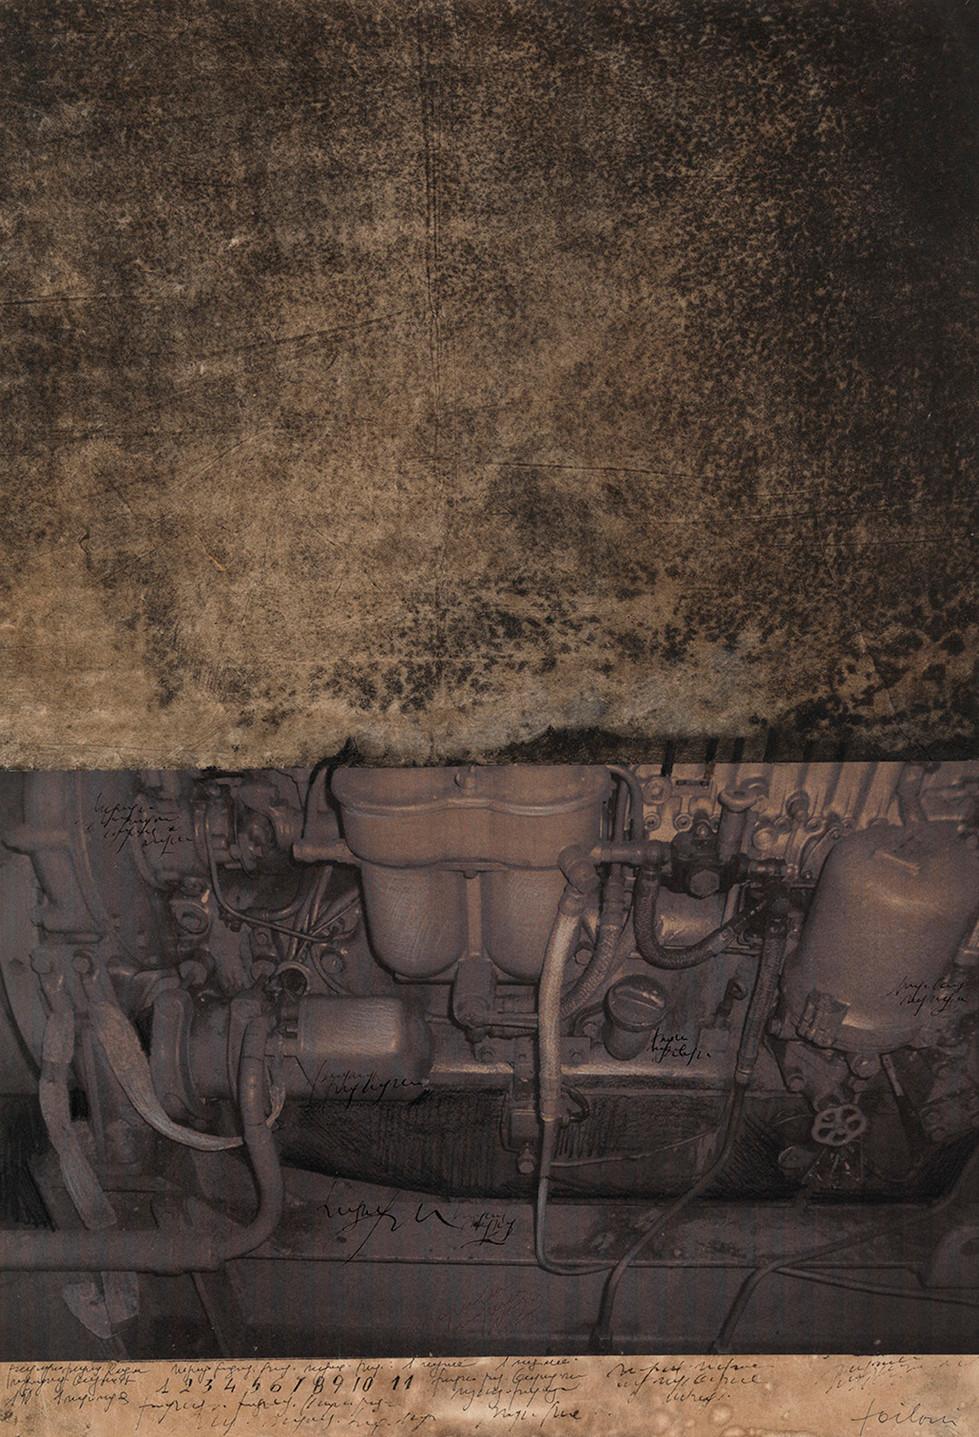 Ursus, 2009, tecnica mista su carta, cm 56,5 x 38,5